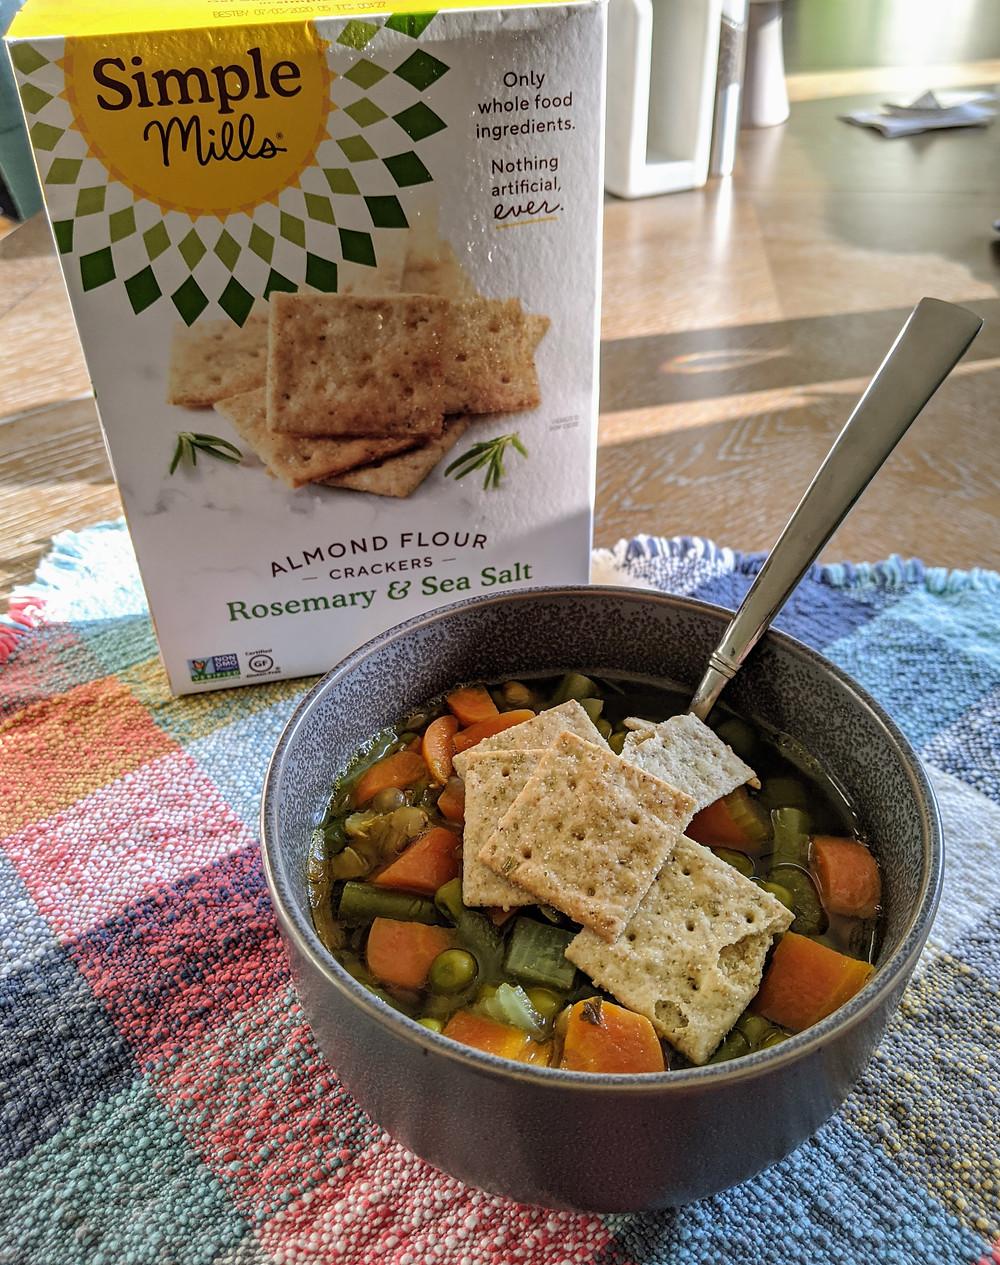 Lentil Vegetable Soup with Simple Mills' Almond Flour Crackers - Amanda MacGregor - food allergy recipes